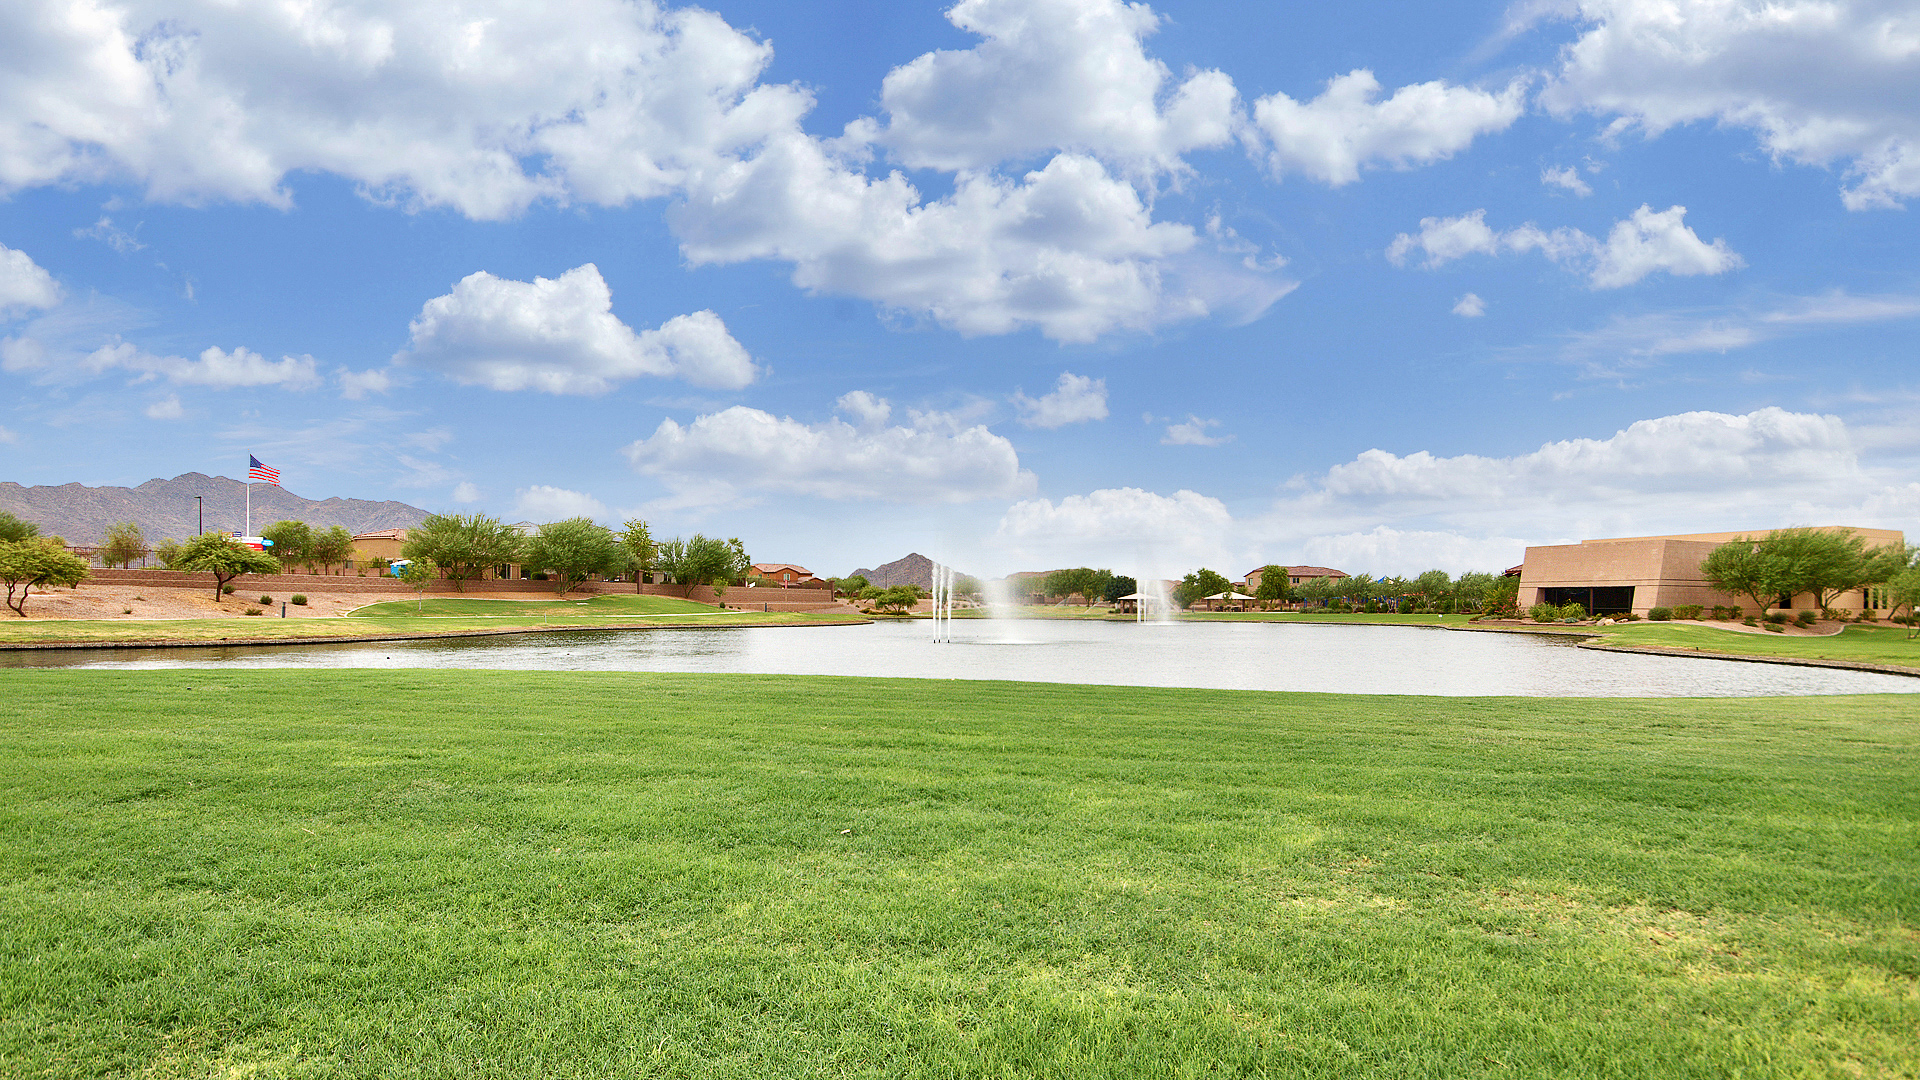 4 bed 2 bath home for sale in adora trails gilbert, arizona